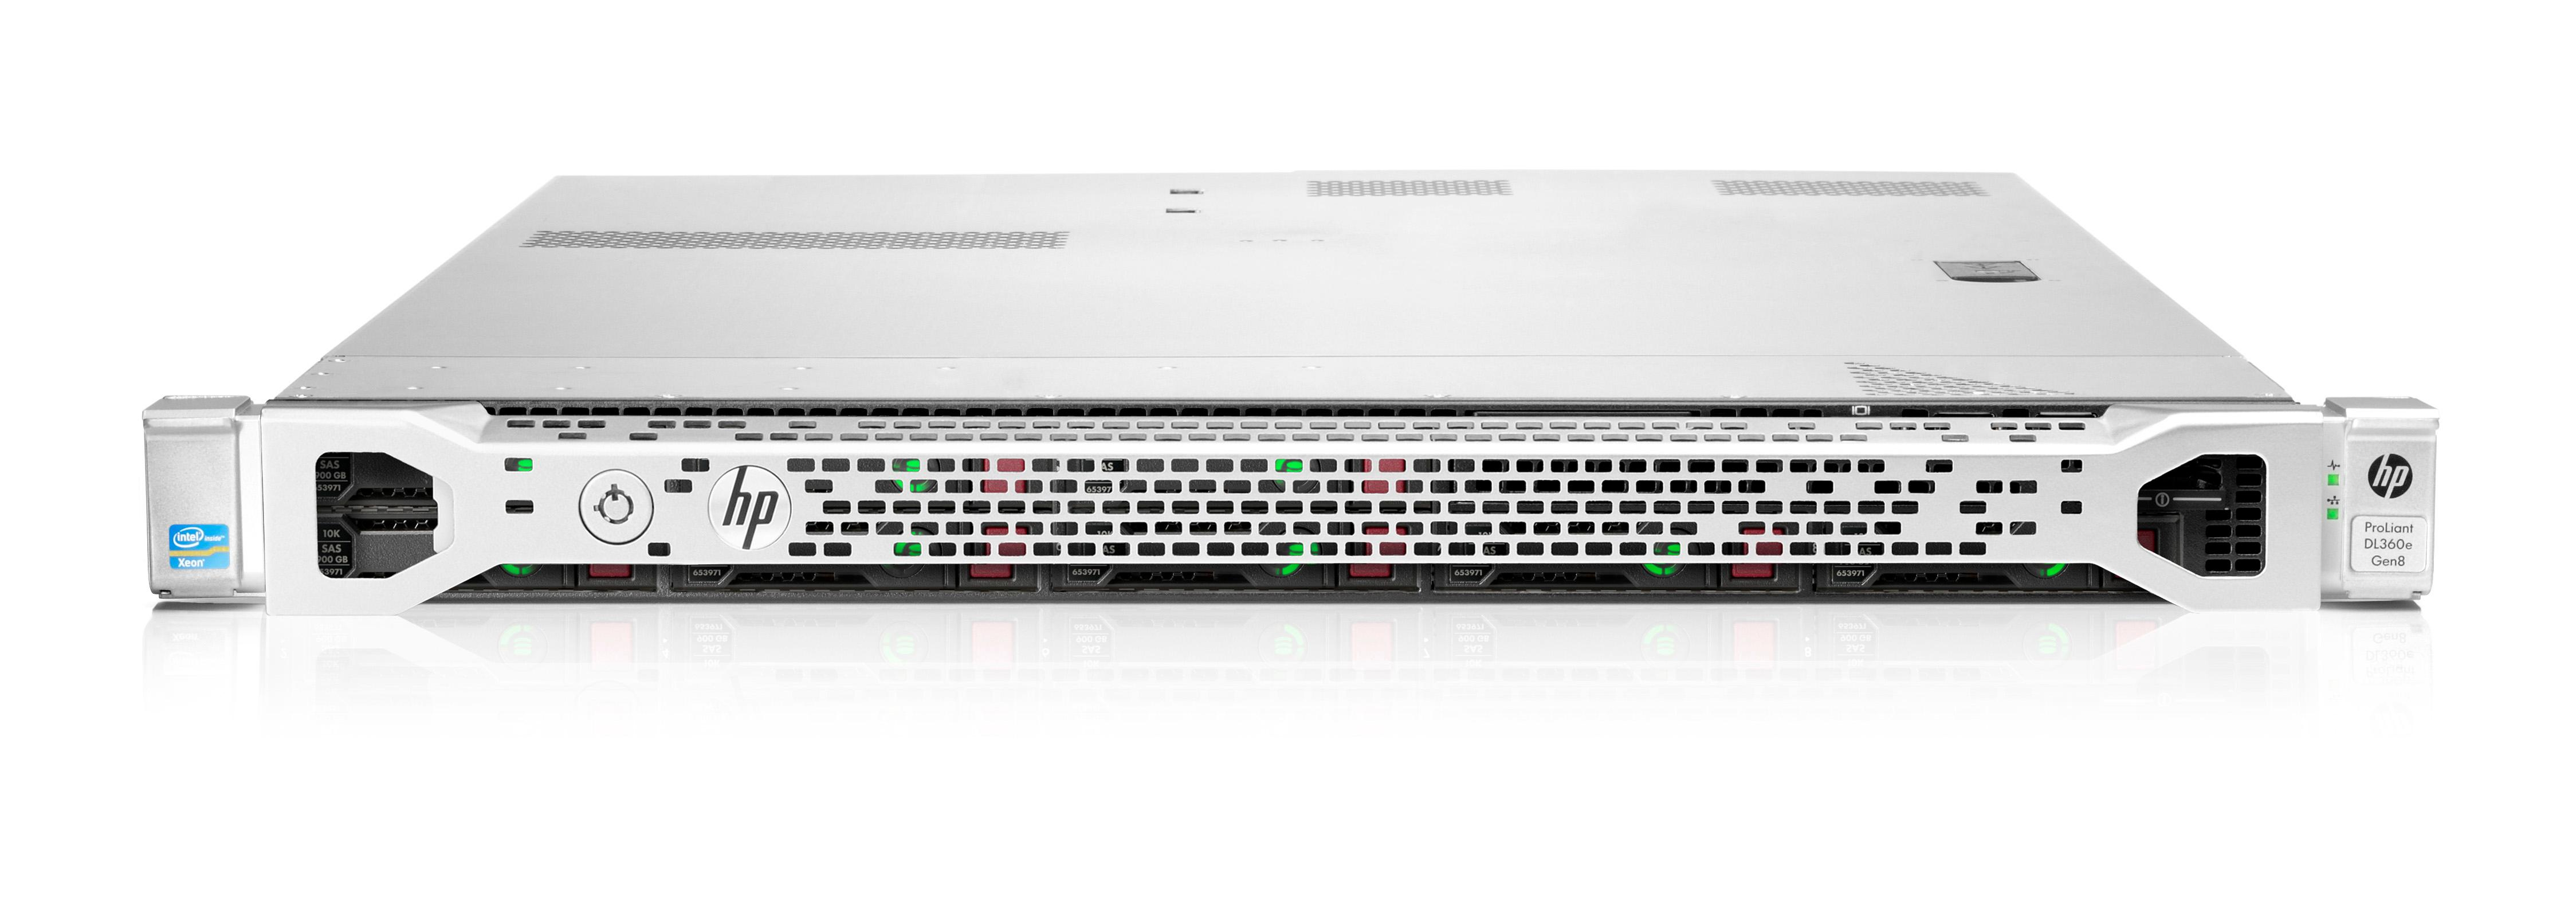 HP ProLiant DL360e Gen8 (1U) Entry Rack Server Xeon E5 (2403) 1.8GHz 4GB-R (No HDD) SAS/SATA SFF (Matrox G200 Graphics) + 460W Common Slot Gold Hot Plug Power Supply